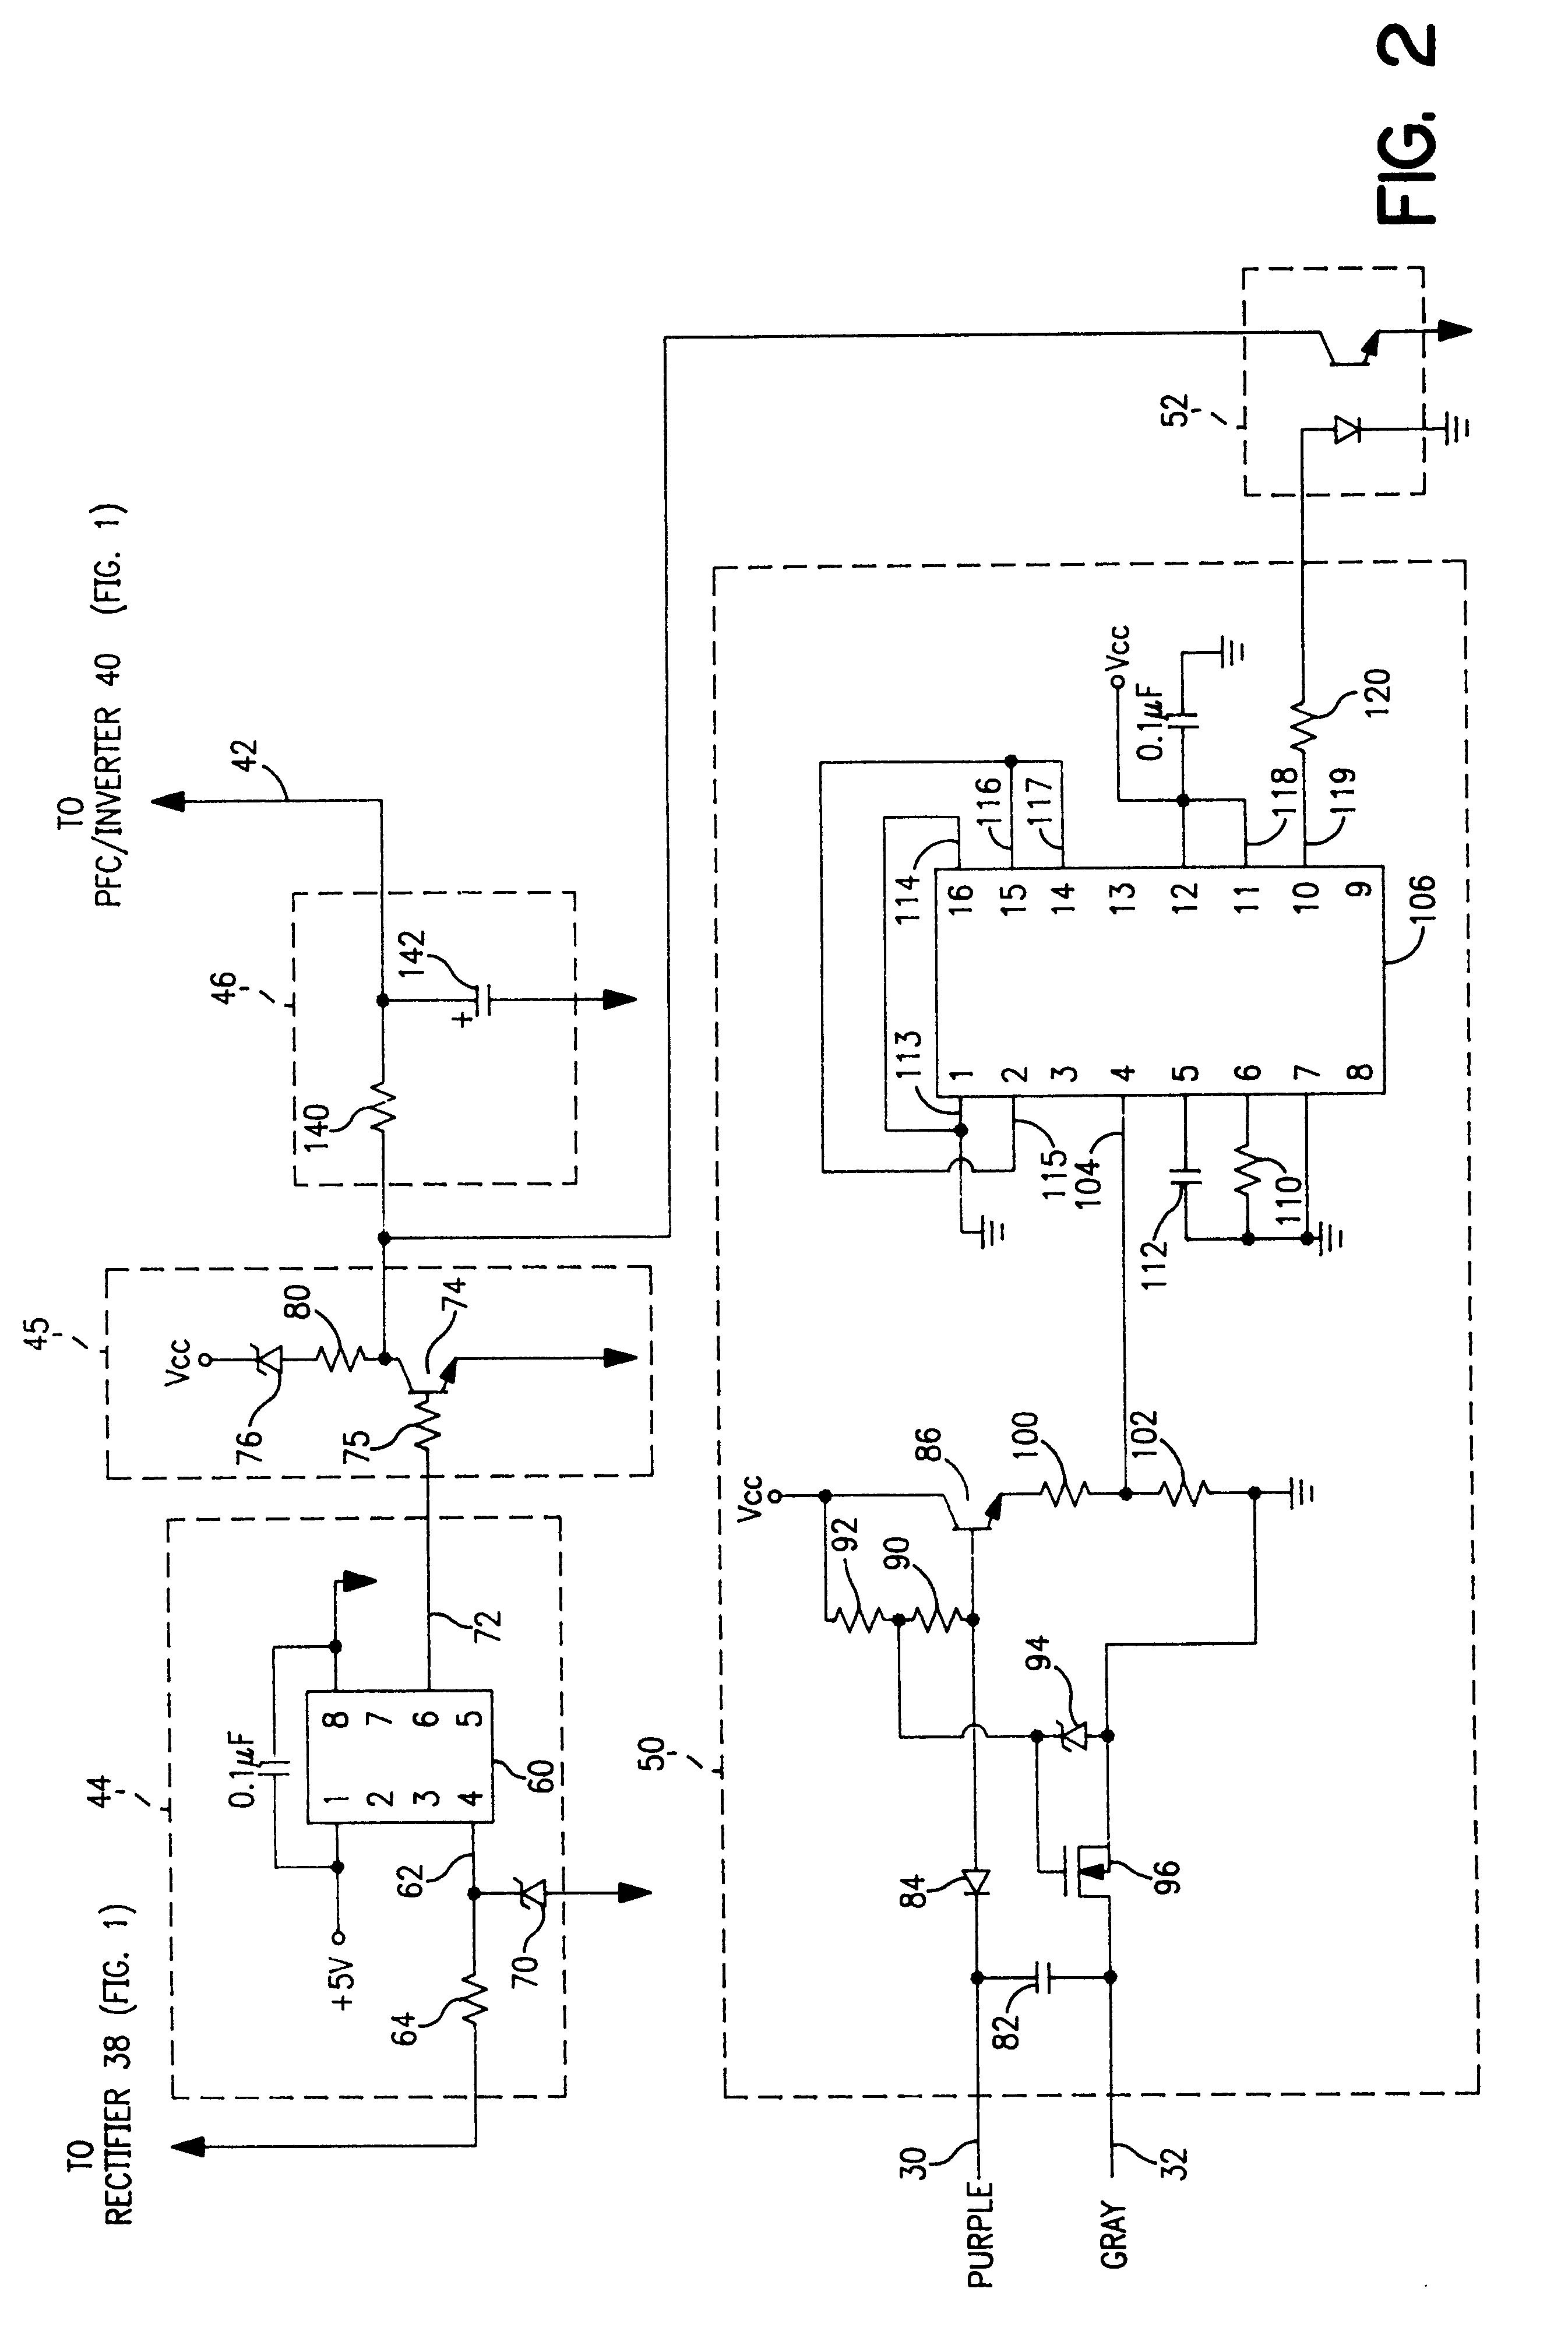 Pressure Sensor  180 With Arduino in addition PT4115 CircuitDiagram furthermore Presentation Bipolar Stepper Motor Driver Circuit also 25701 Esr10000 in addition Arduino Mega 2560. on series circuit diagram